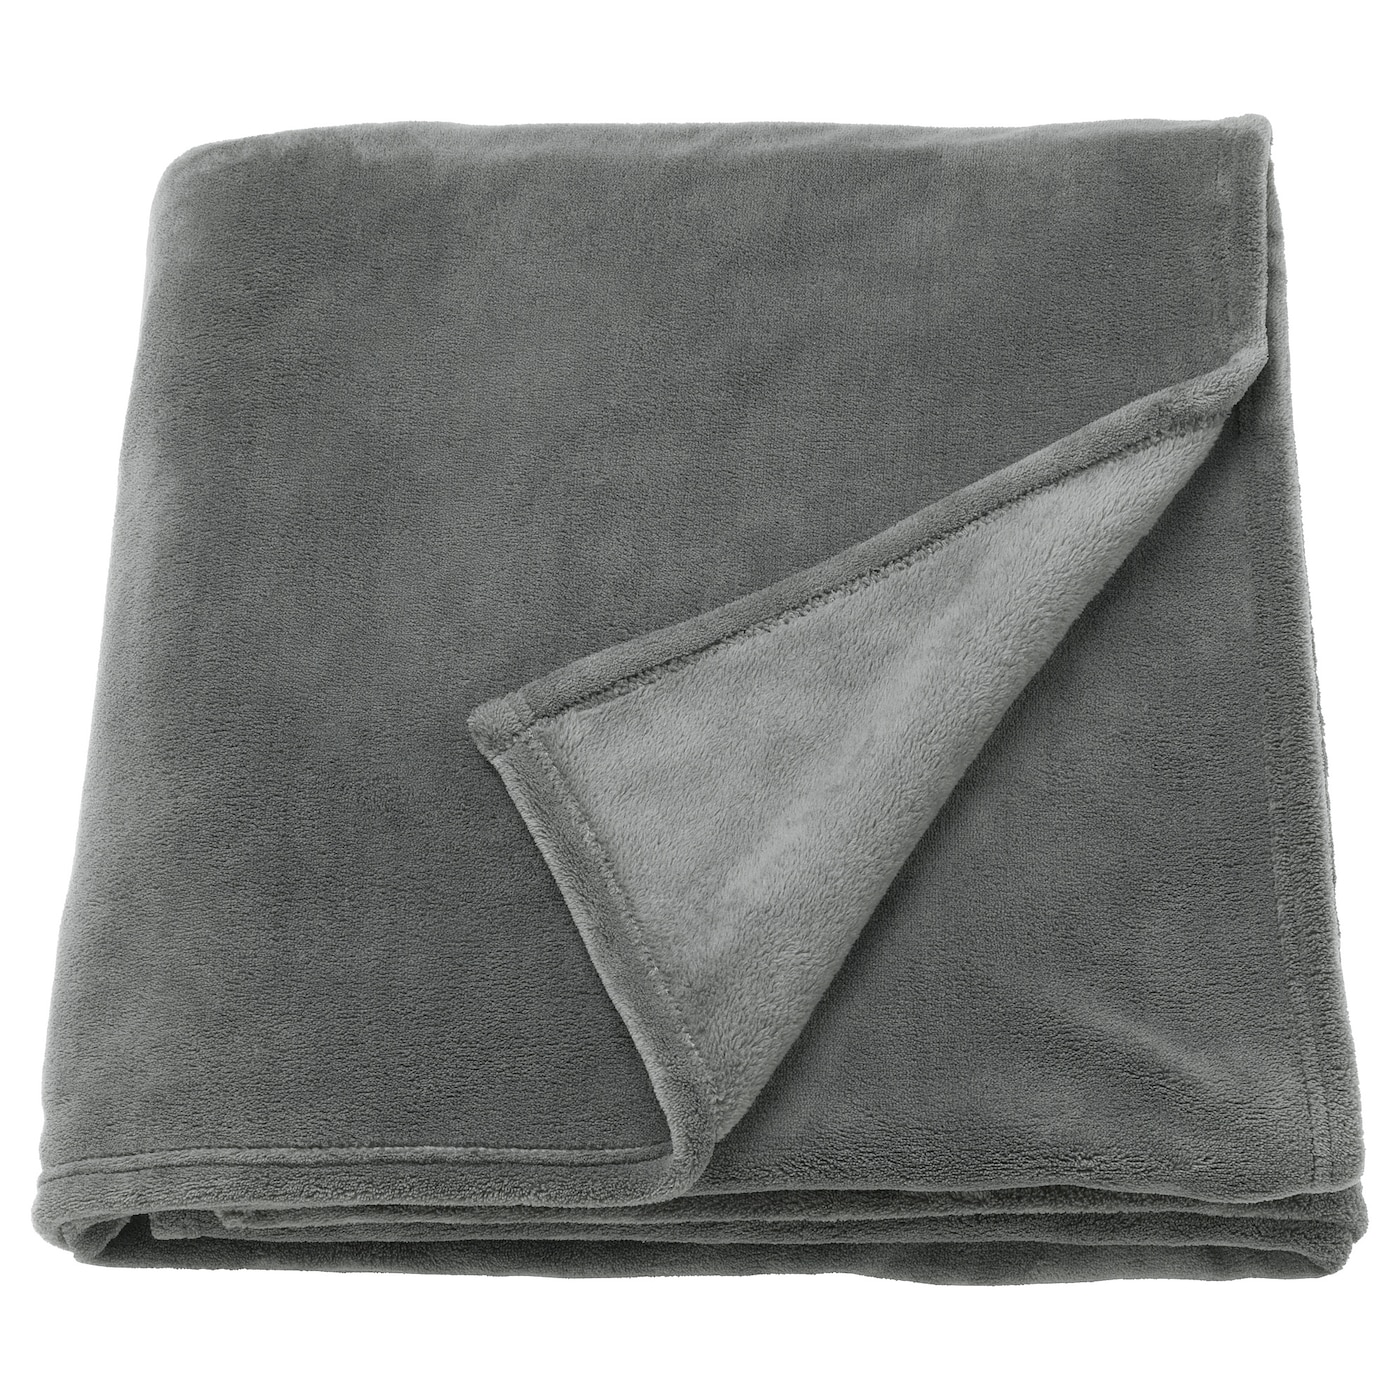 TRATTVIVA Bedspread - gray - IKEA